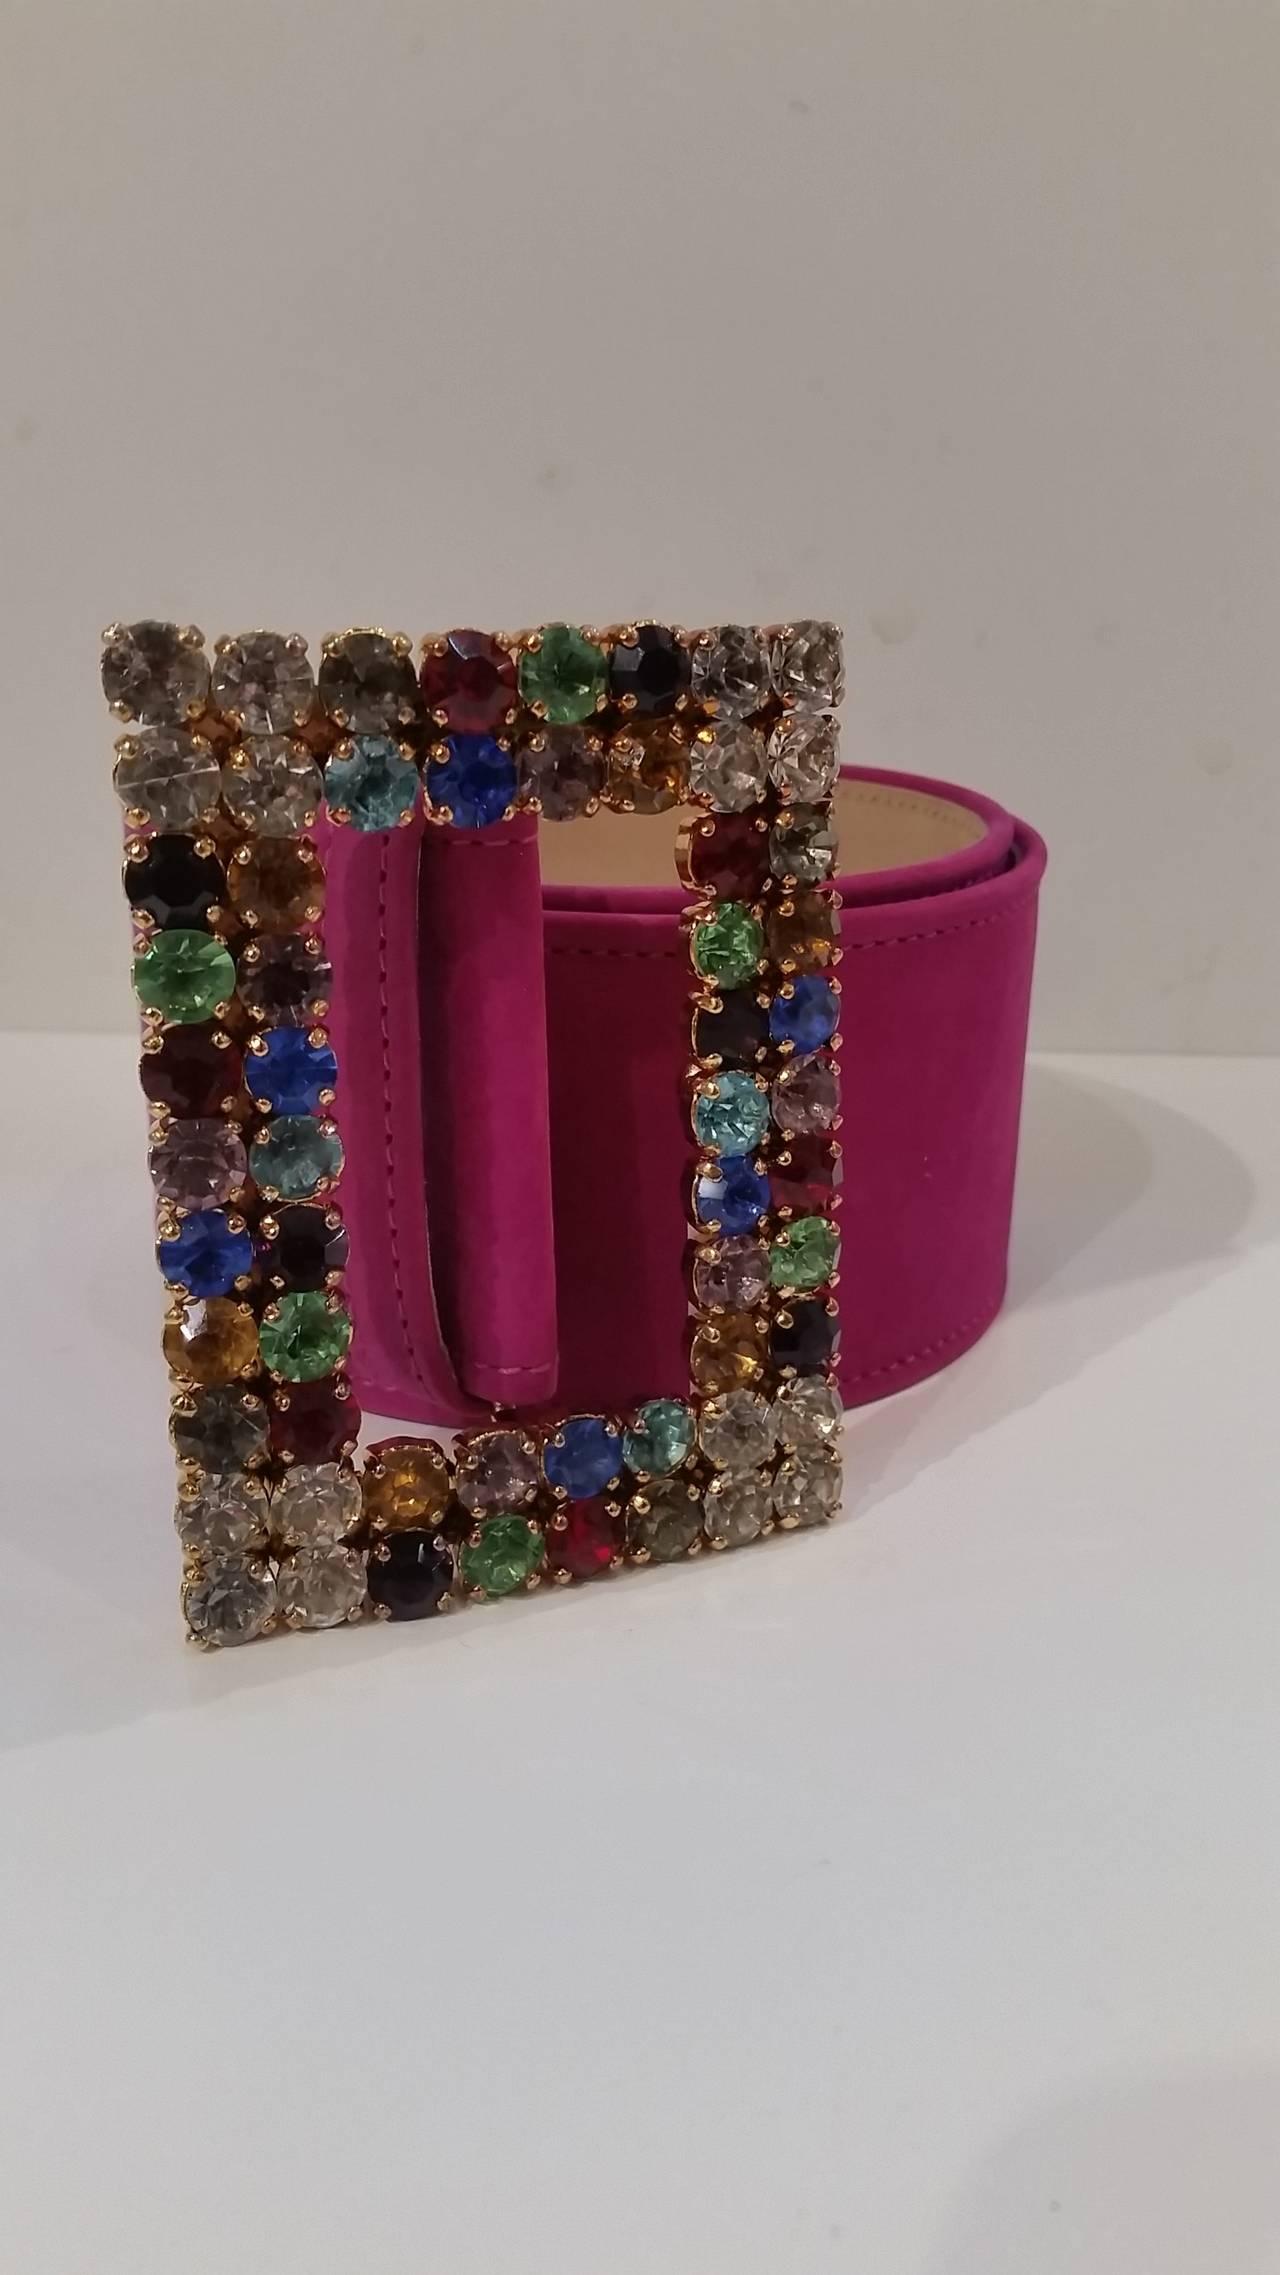 1970s Moschino Vintage fuchsia belt with Swarovski crystals 2